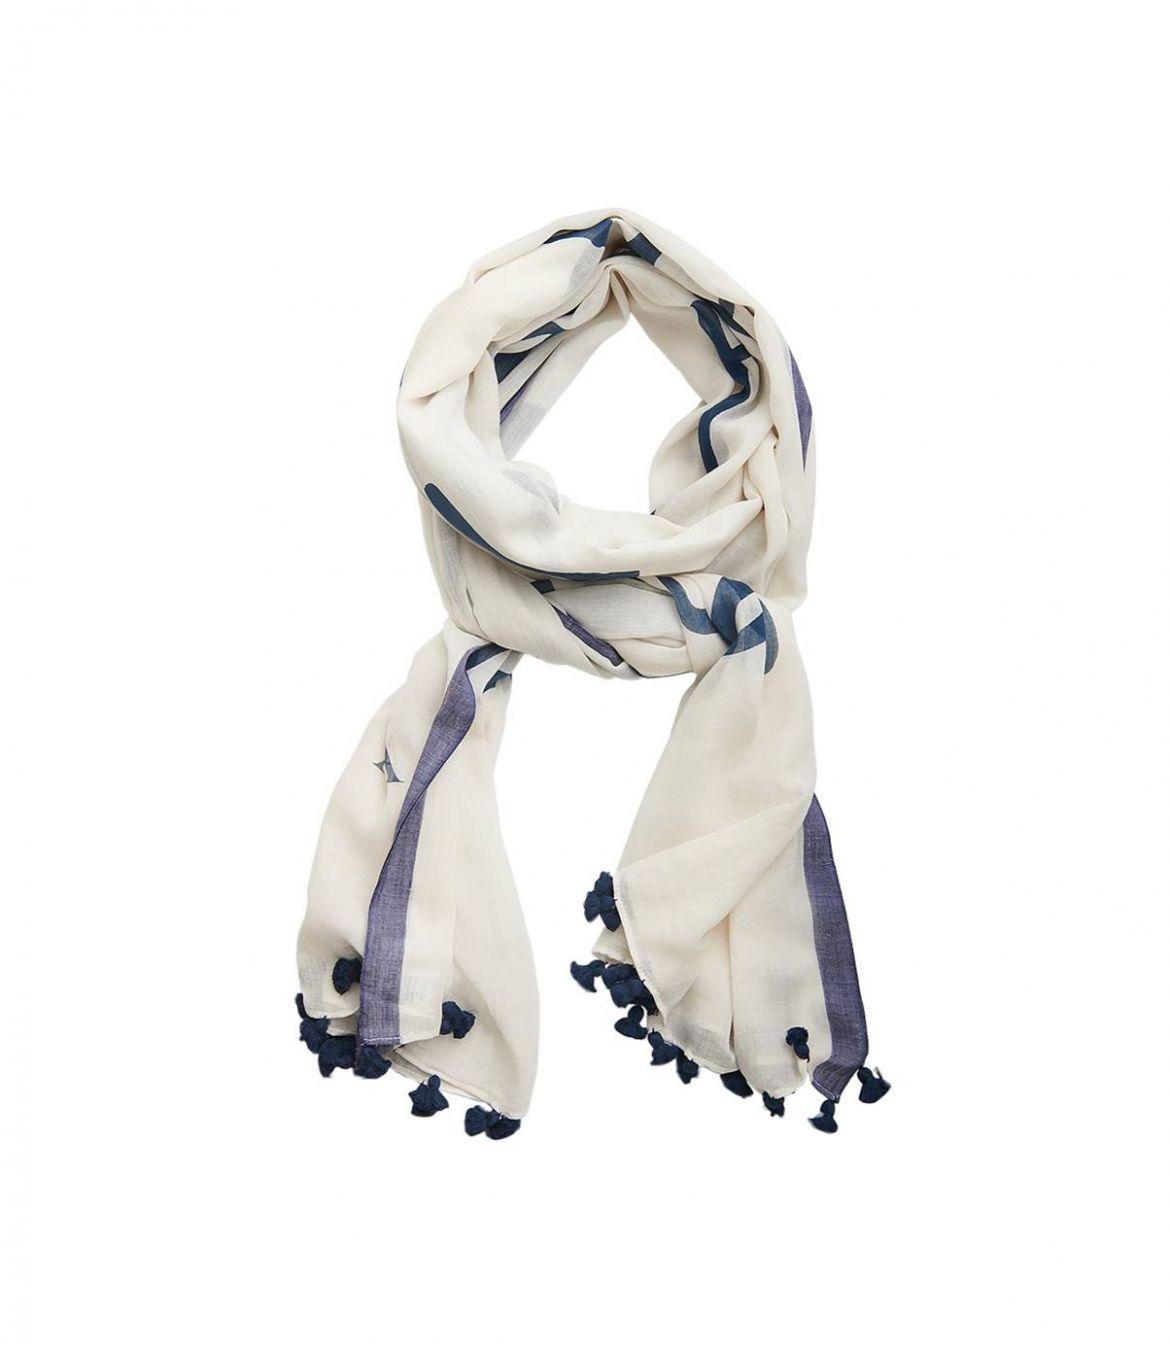 INO Women's Cotton Scarf 100x200 cm Storiatipic - 1